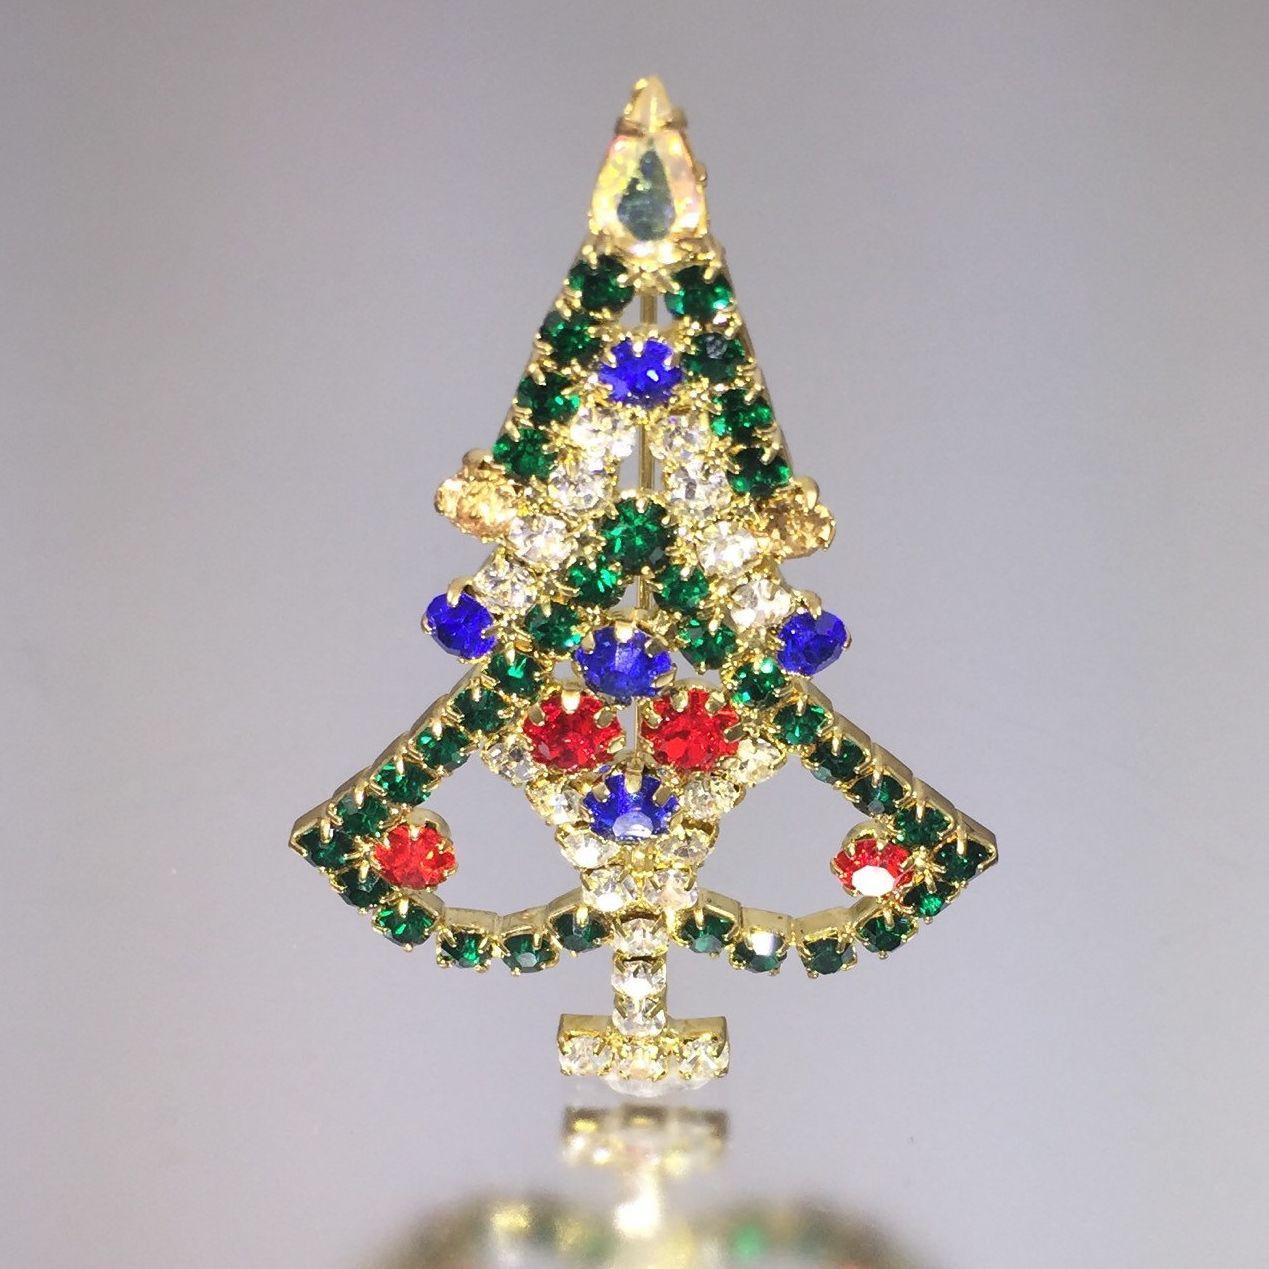 Rhinestone Christmas Tree Pin - Vintage Jeweled Xmas Tree Brooch